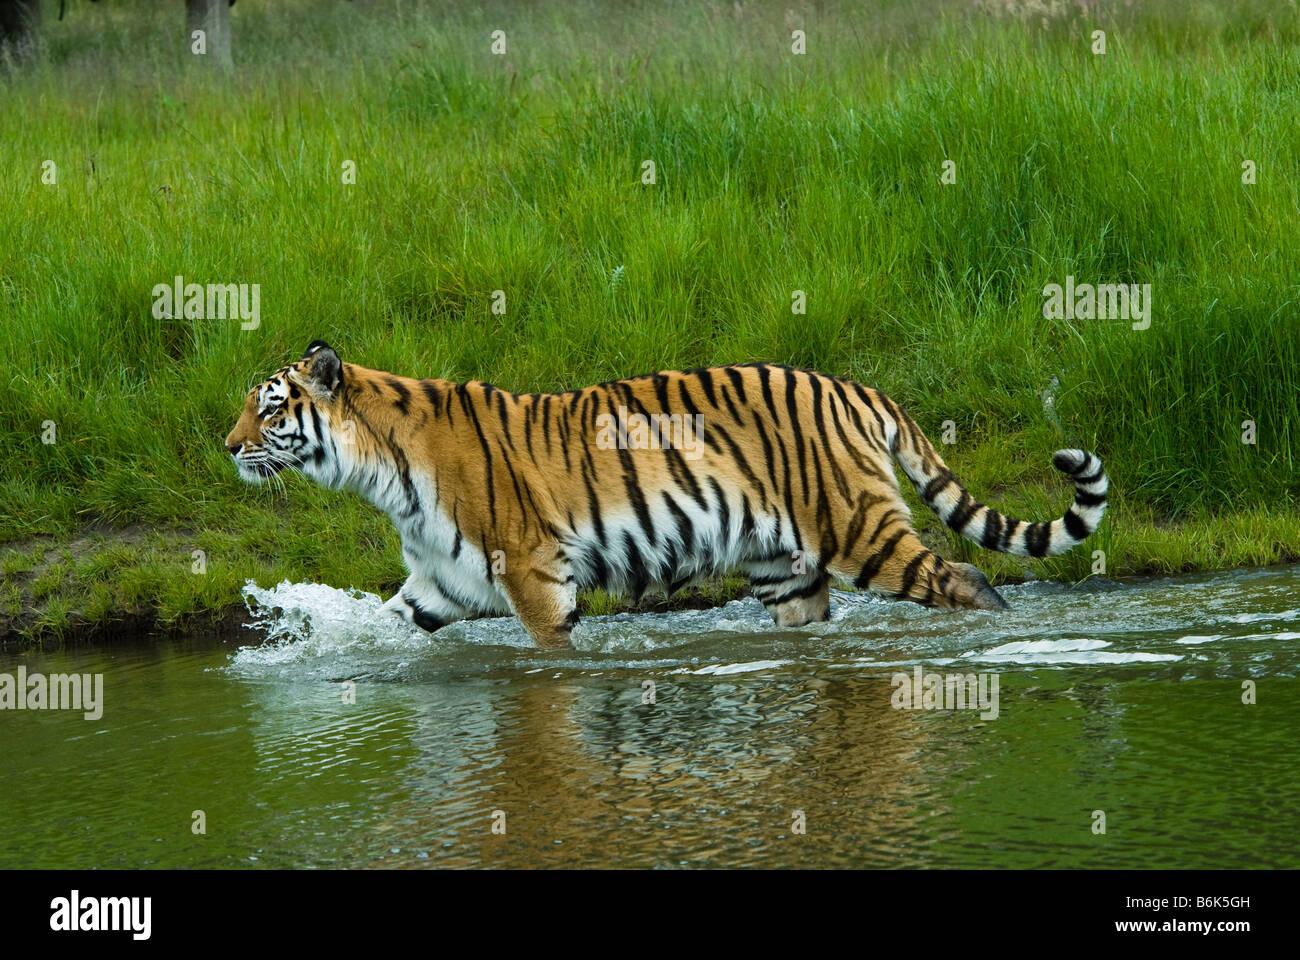 Siberian tiger Tiger Panthera tigris altaica in water - Stock Image